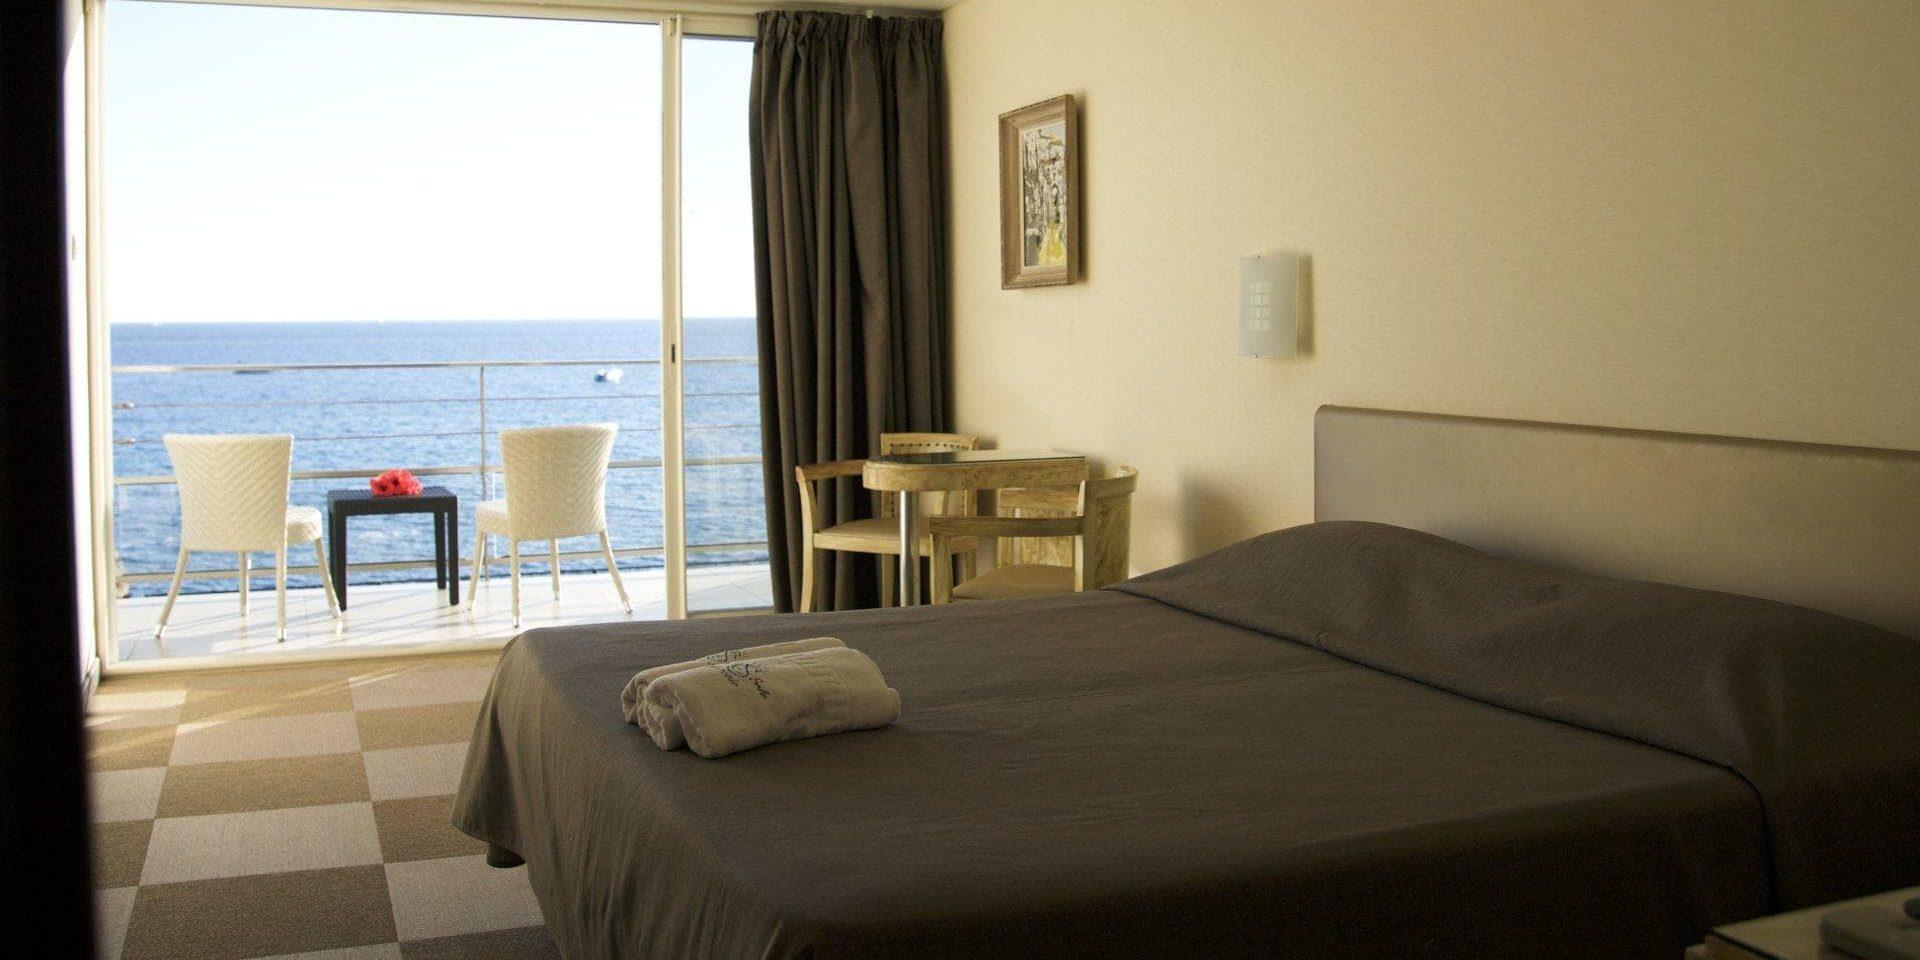 Hotel Cala di Sole Ajaccio Corsica Frankrijk tweepersoonskamer balkon zeezicht